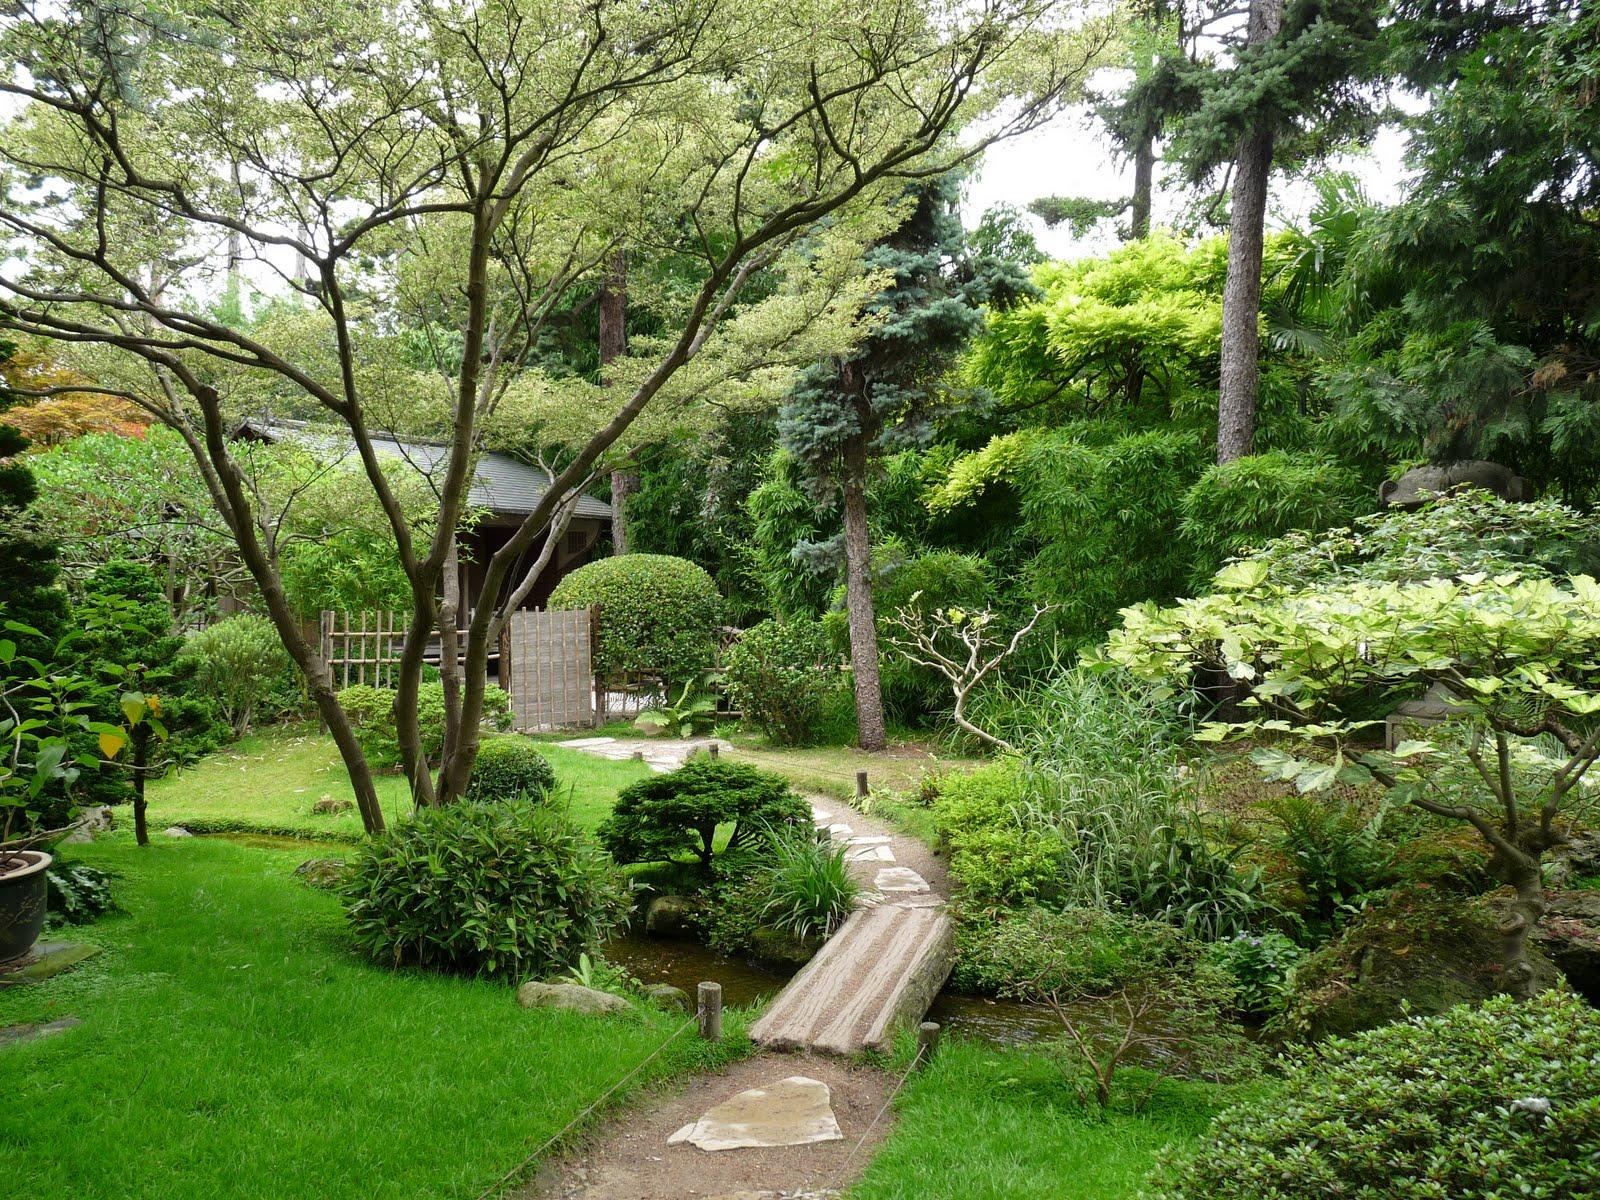 Mes autres carnets jardins albert kahn for Jardin anglais pinterest